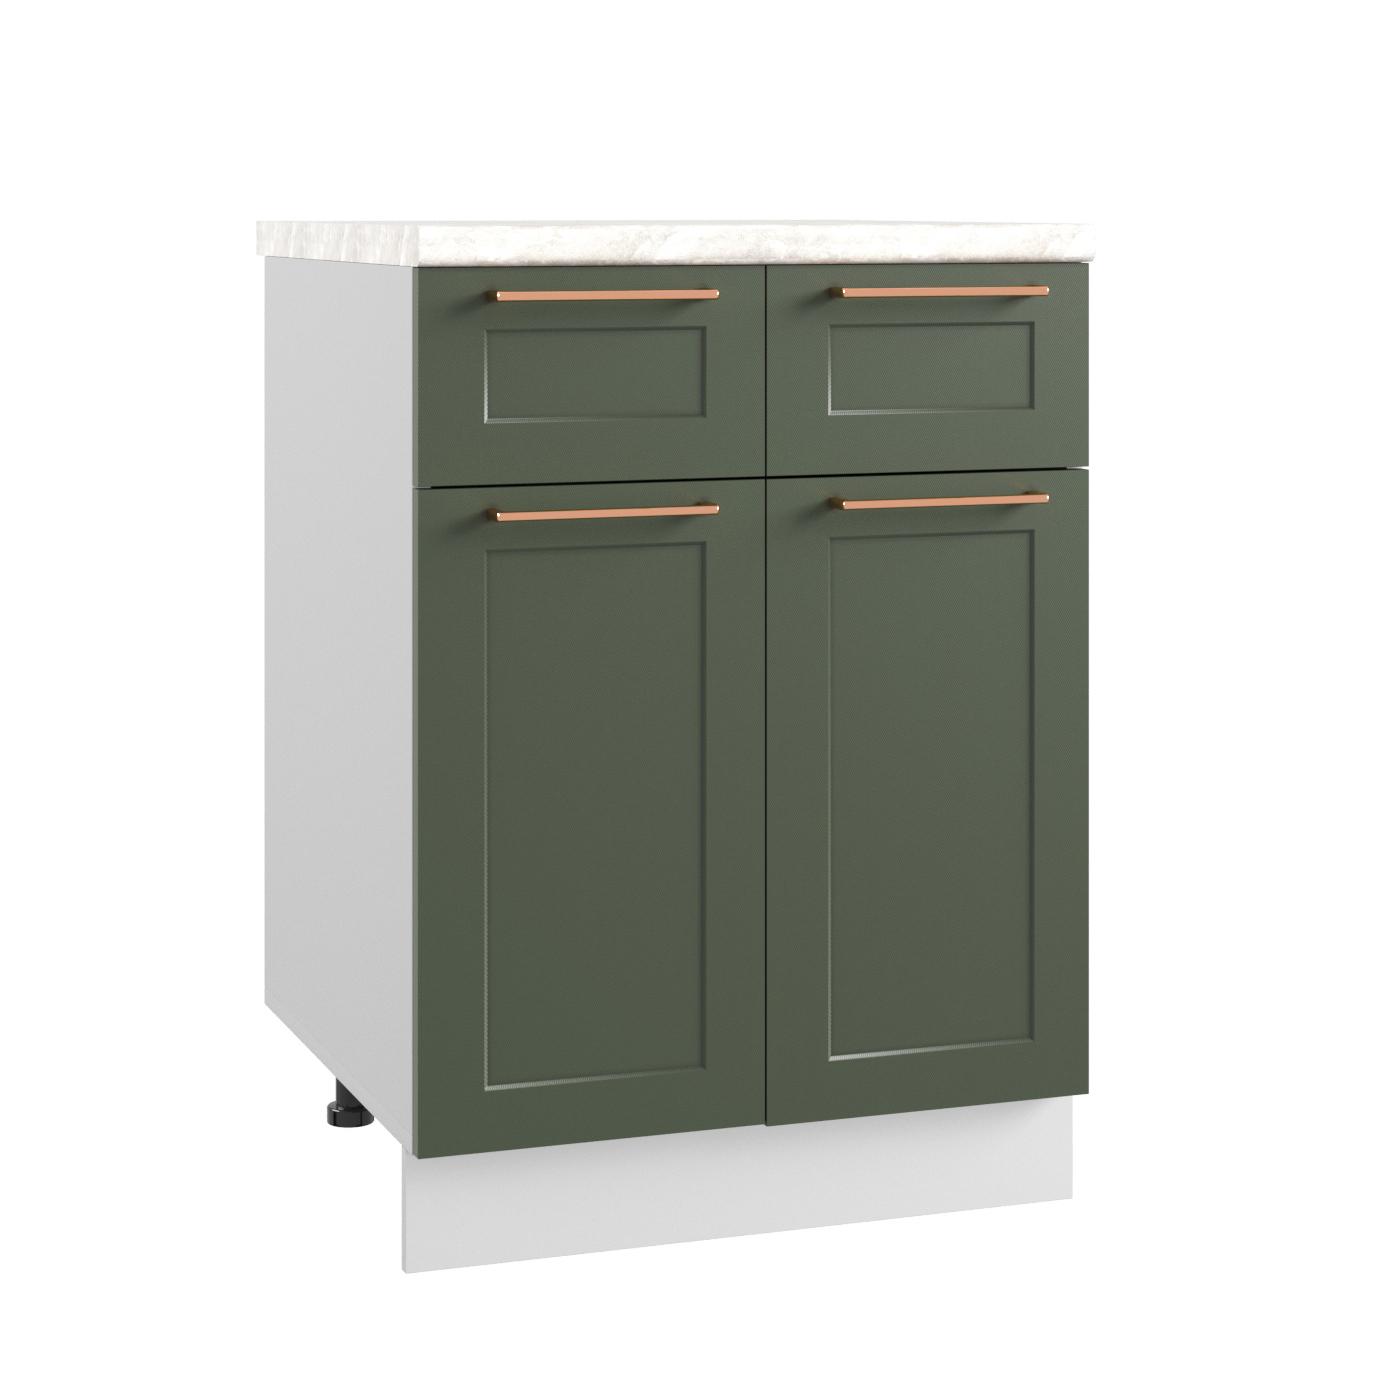 Кухня Квадро С2Я 600 Шкаф нижний с ящиками